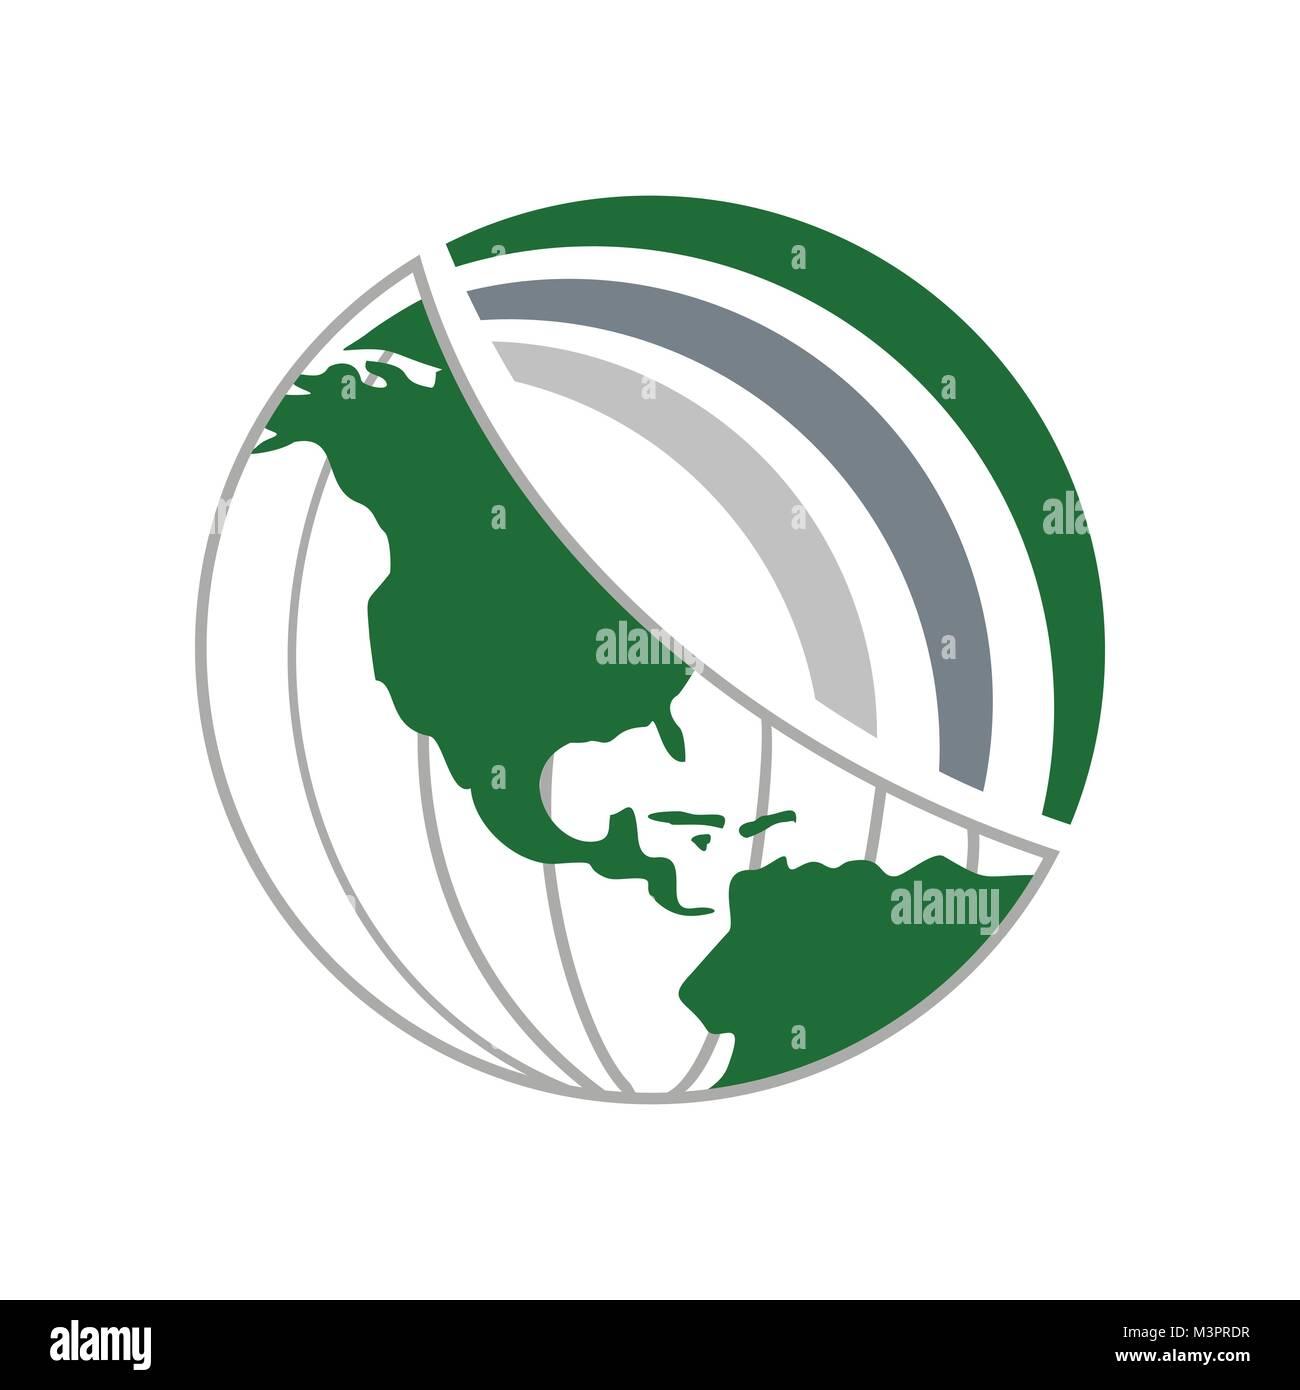 Green World Global Network Vector Symbol Graphic Logo Design - Stock Image